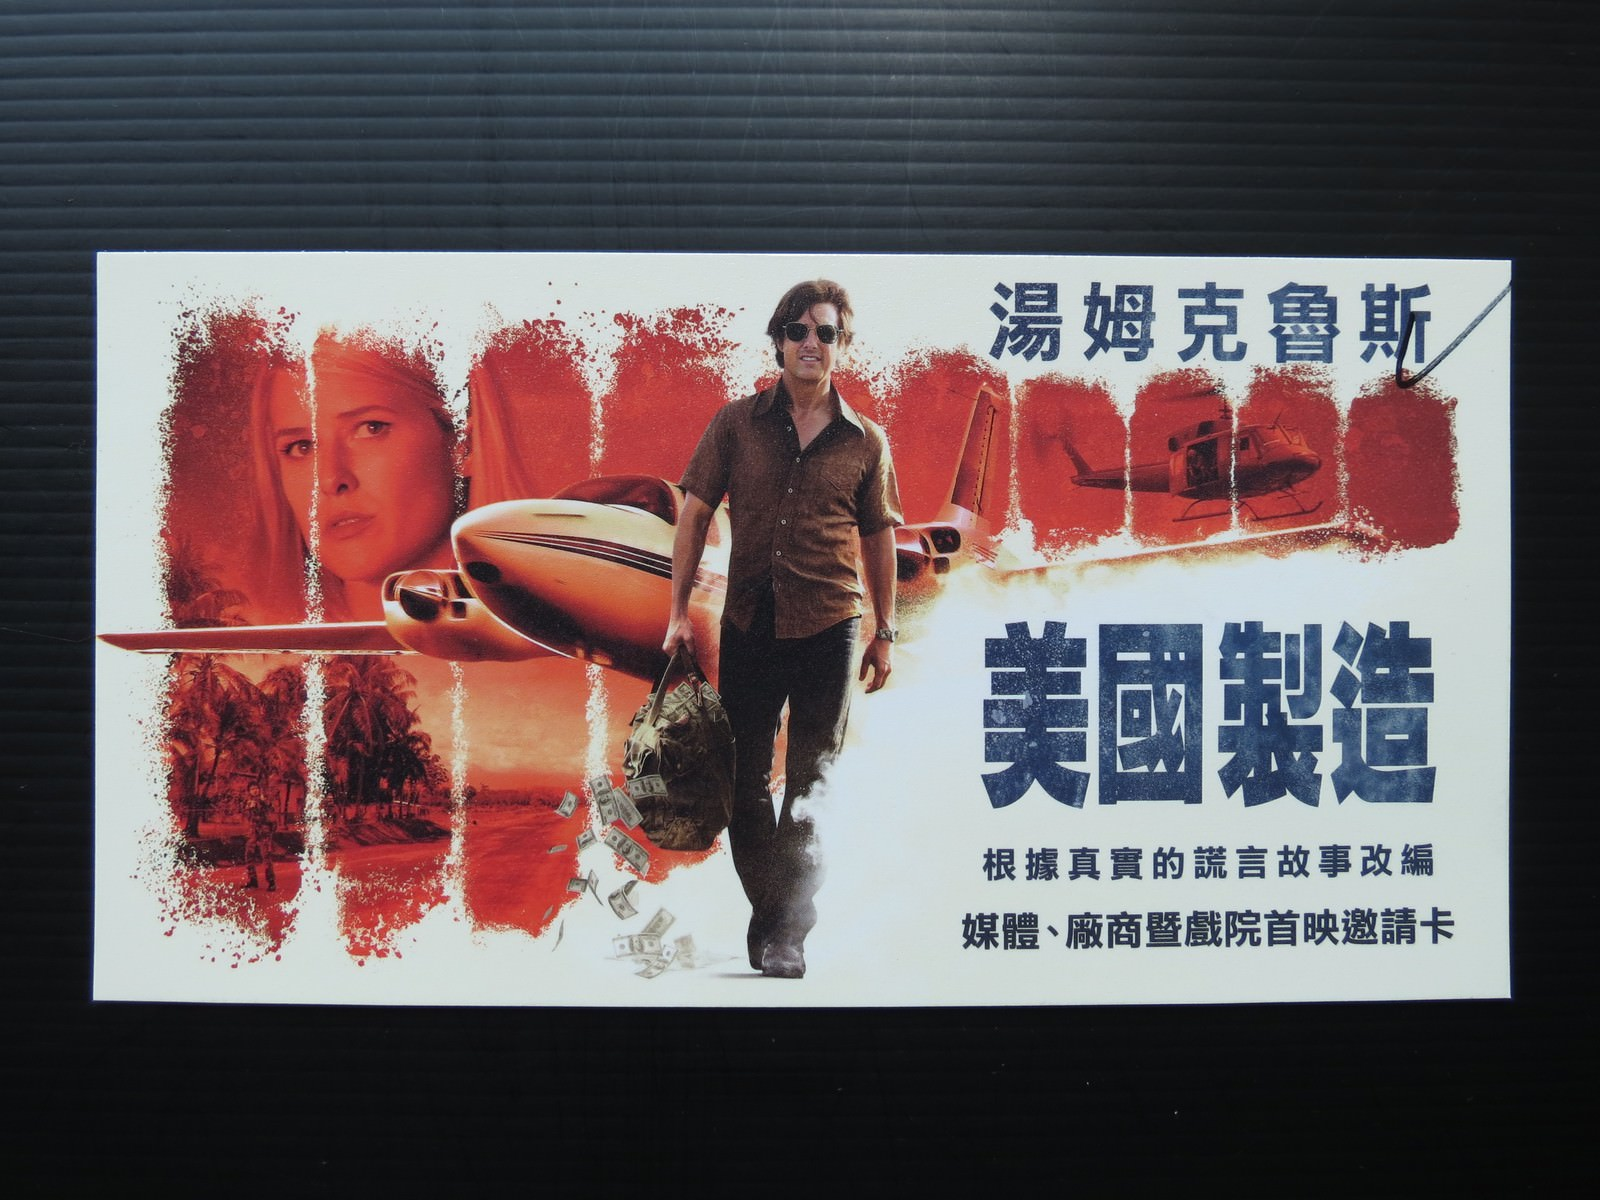 Movie, American Made(美國, 2017年) / 美國製造(台灣) / 巴利薛爾: 飛常任務(香港), 特映會邀請卡